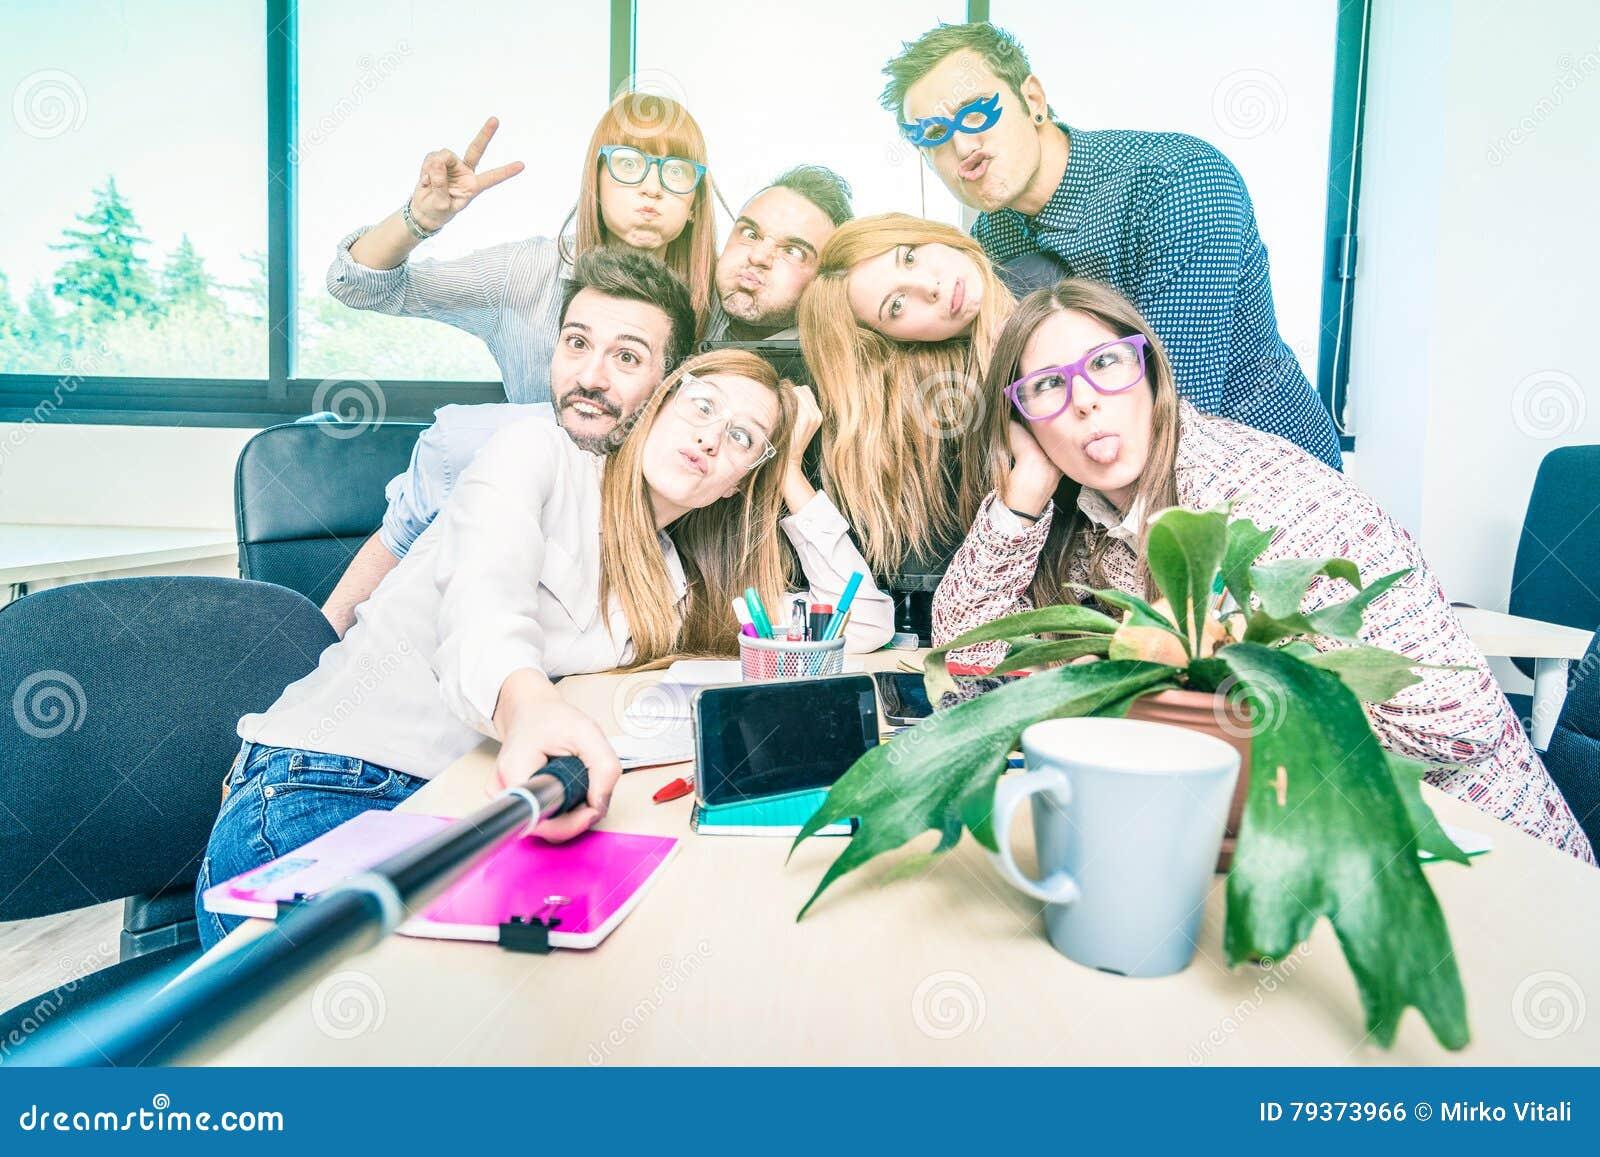 Group of happy students employee workers taking selfie